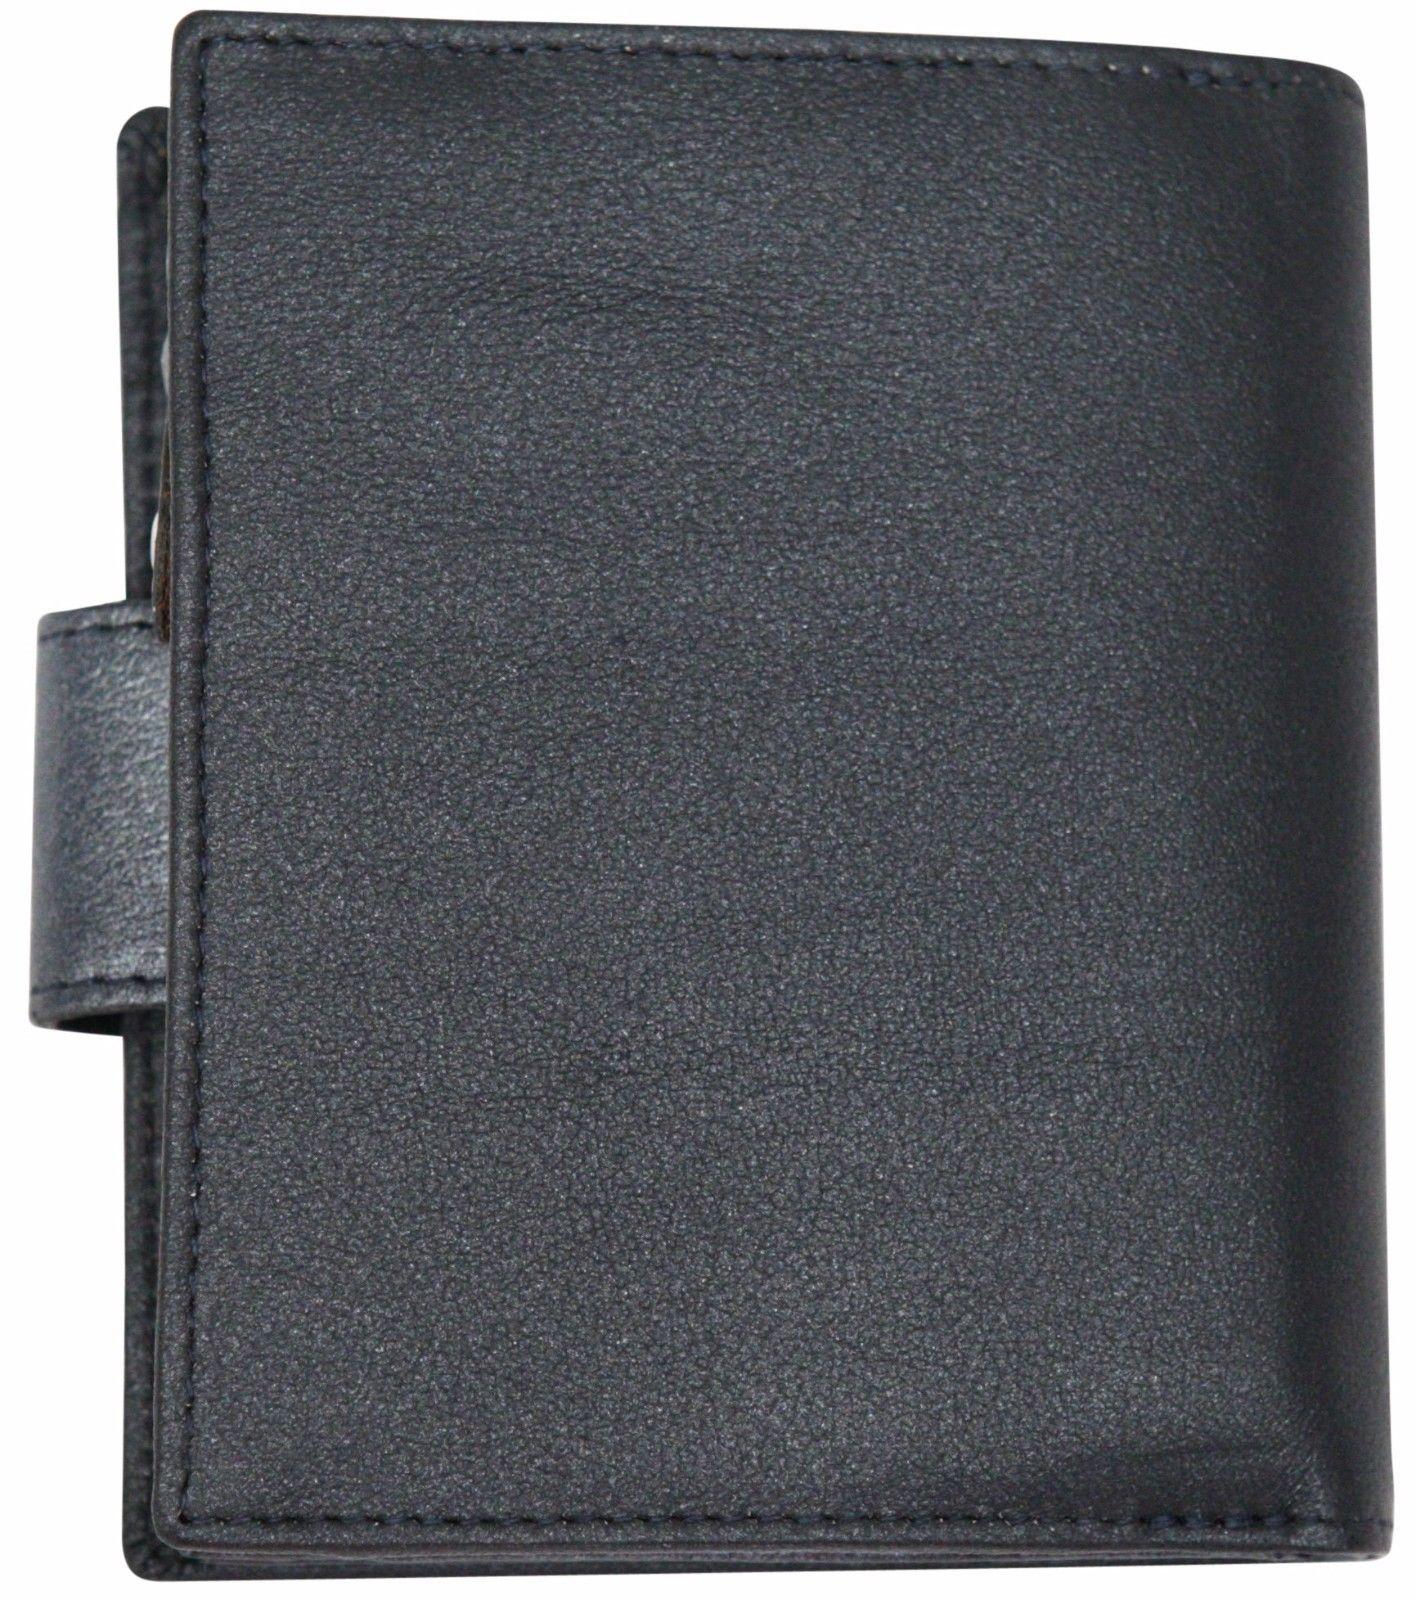 Felda-RFID-onorevoli-MEDAGLIA-amp-Card-Purse-Wallet-Genuine-Leather-Multi-SOFT-BOX-REGALO miniatura 53